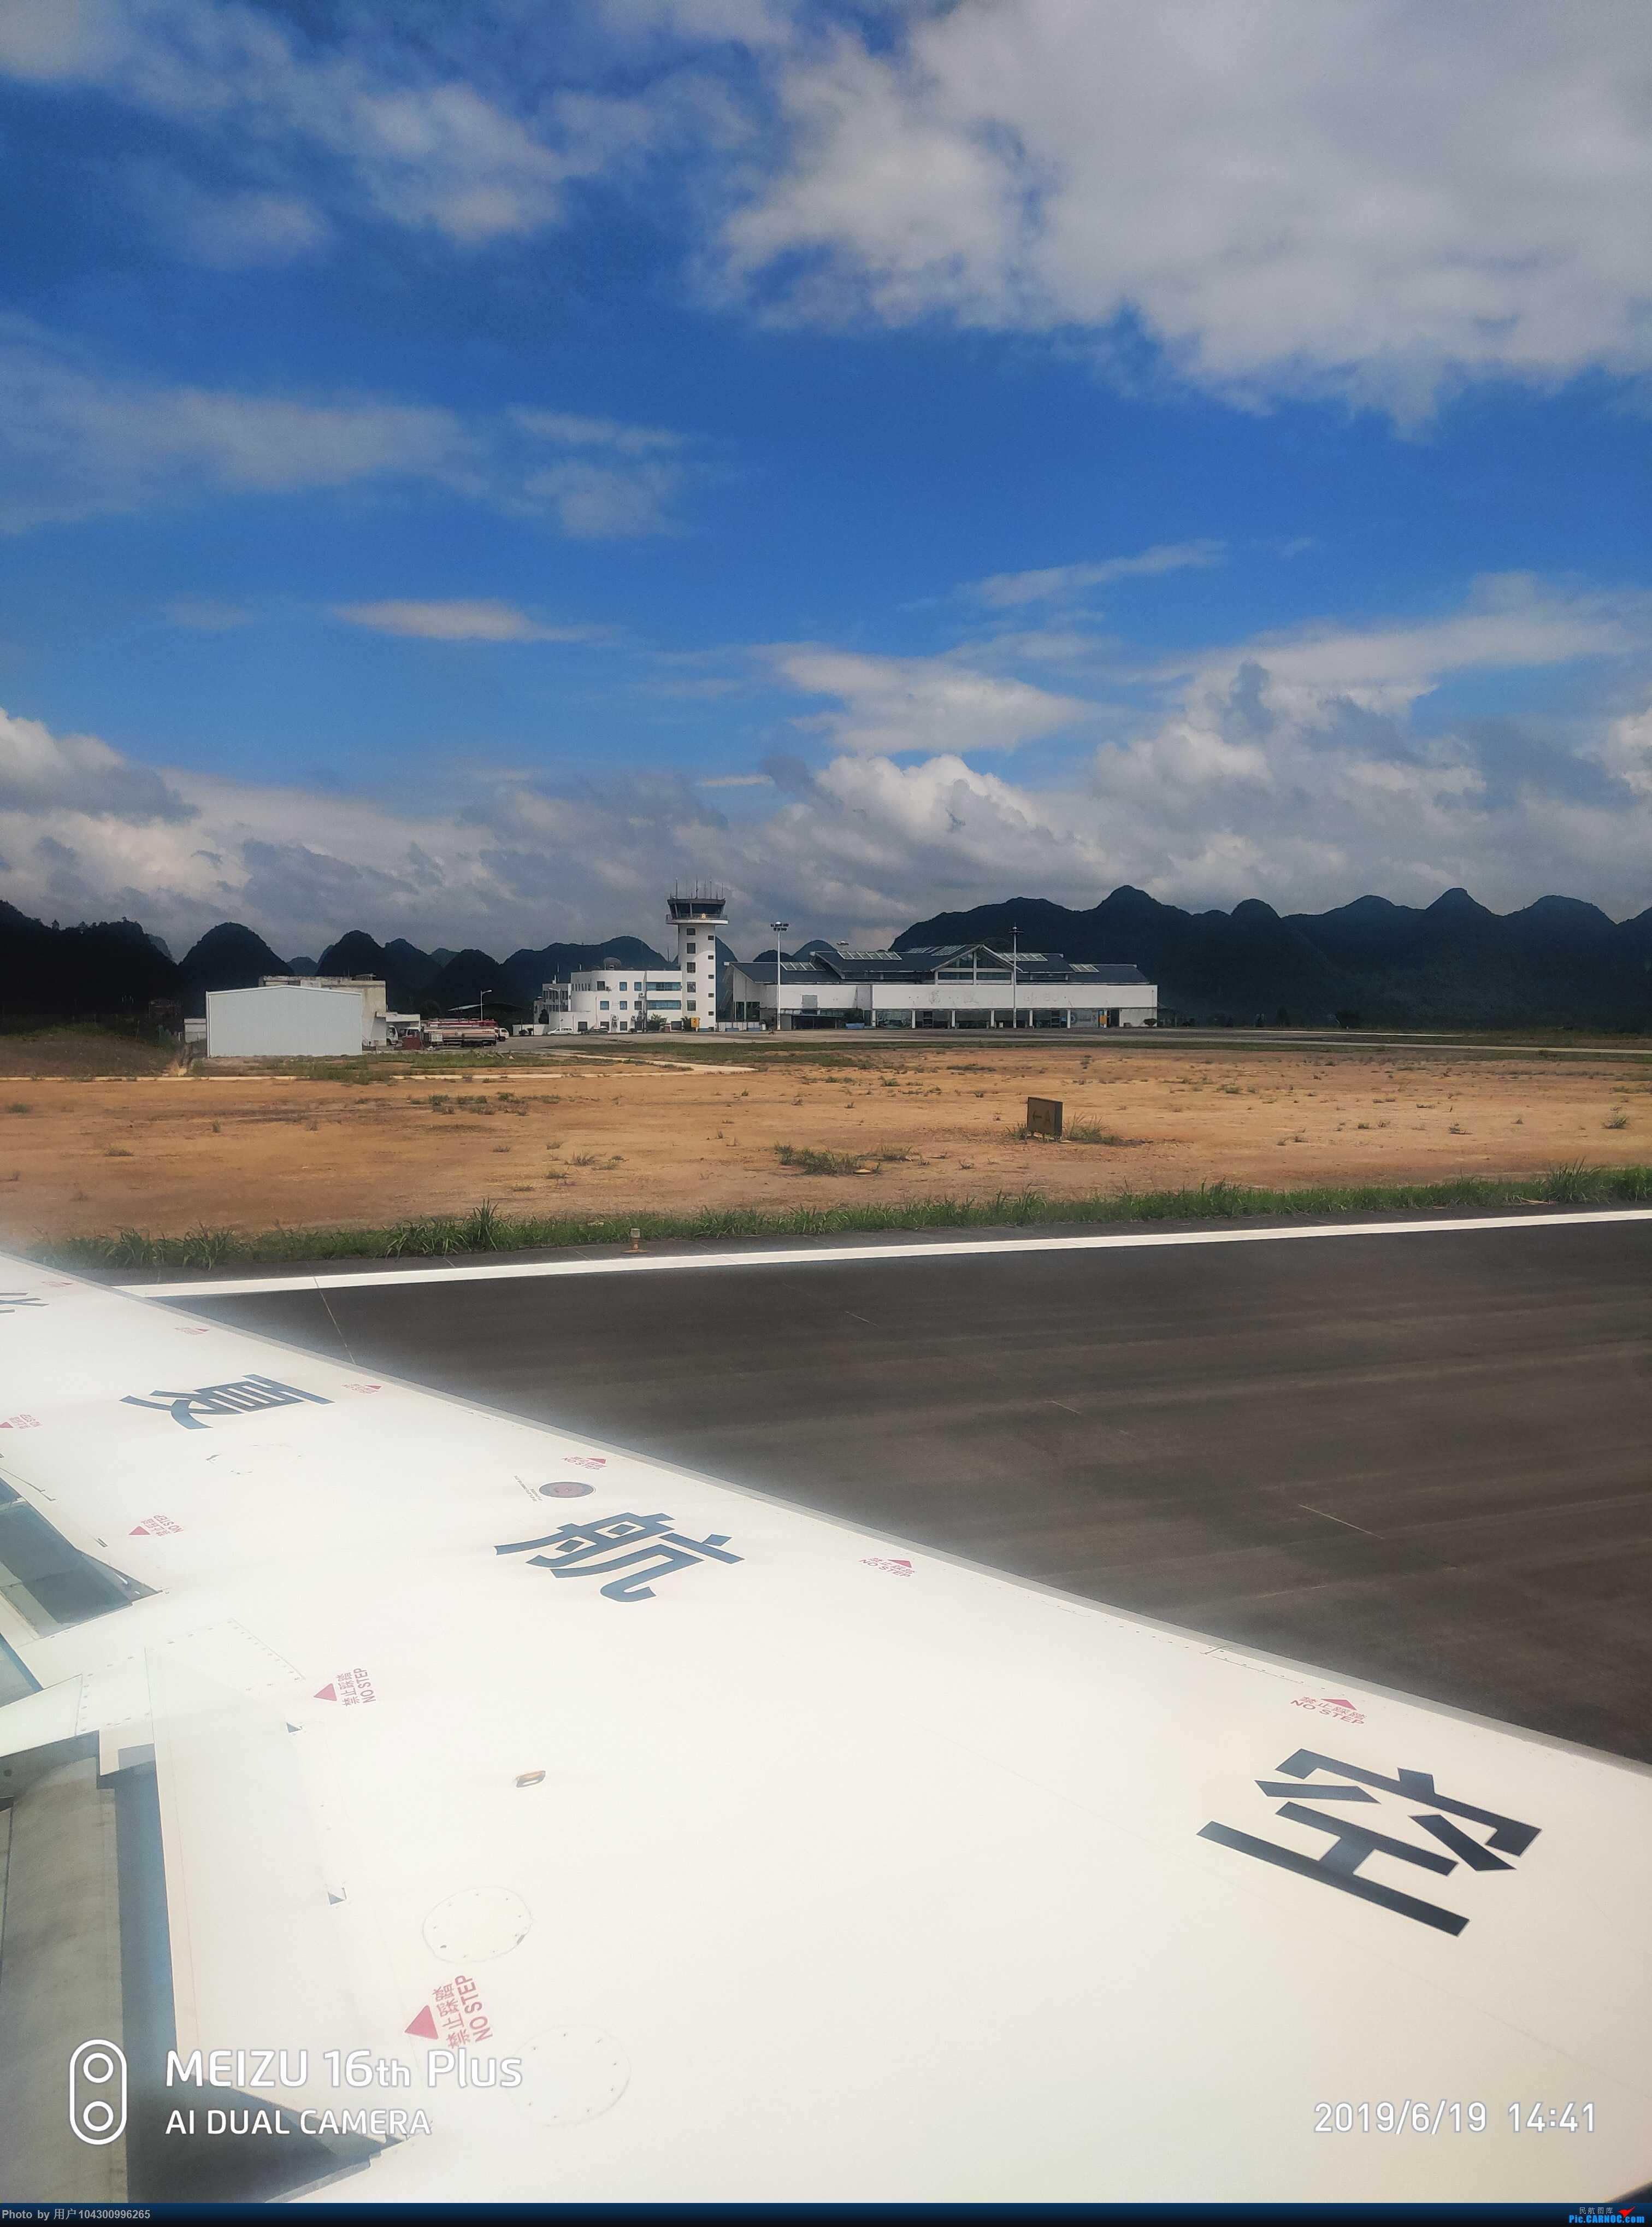 Re:[原创]DM哥飞行游记--贵阳往返荔波2日游 BOMBARDIER CRJ900NG B-3237 中国荔波机场